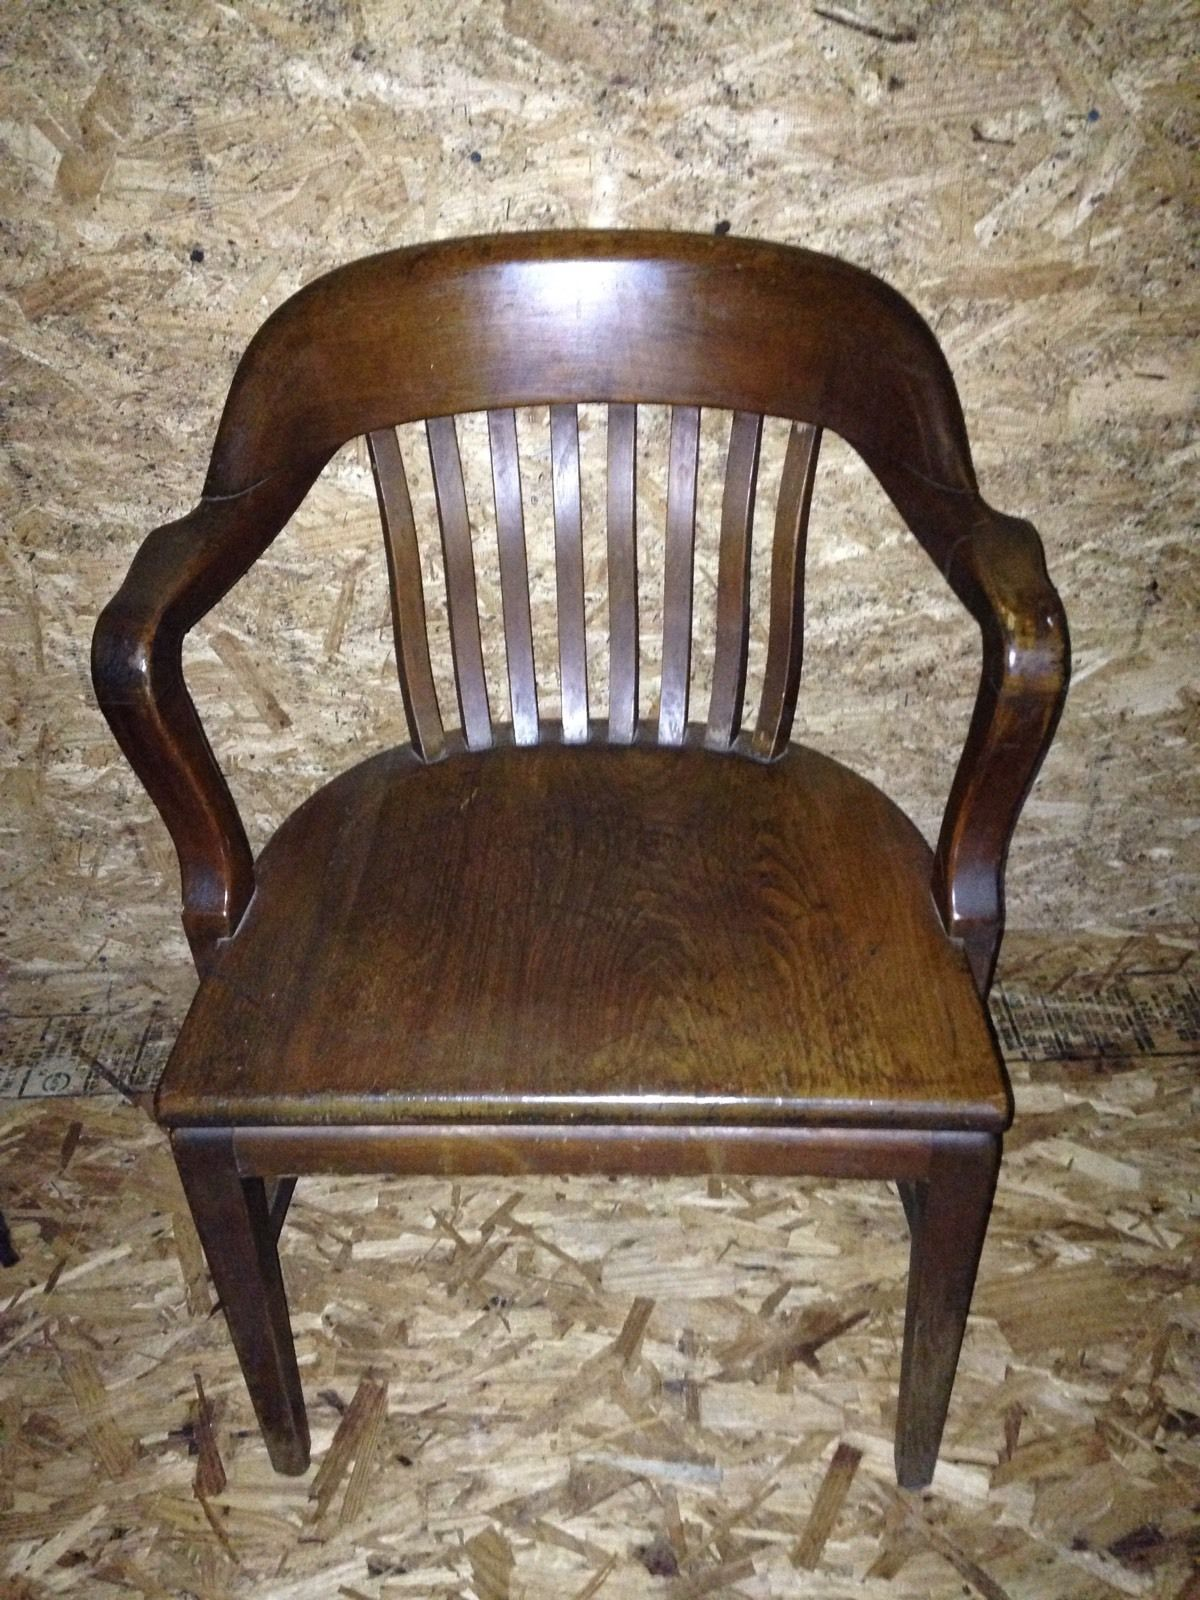 Globe Wernicke Antique Banker Lawyers Jury Arm Chair Desk Chair | EBay